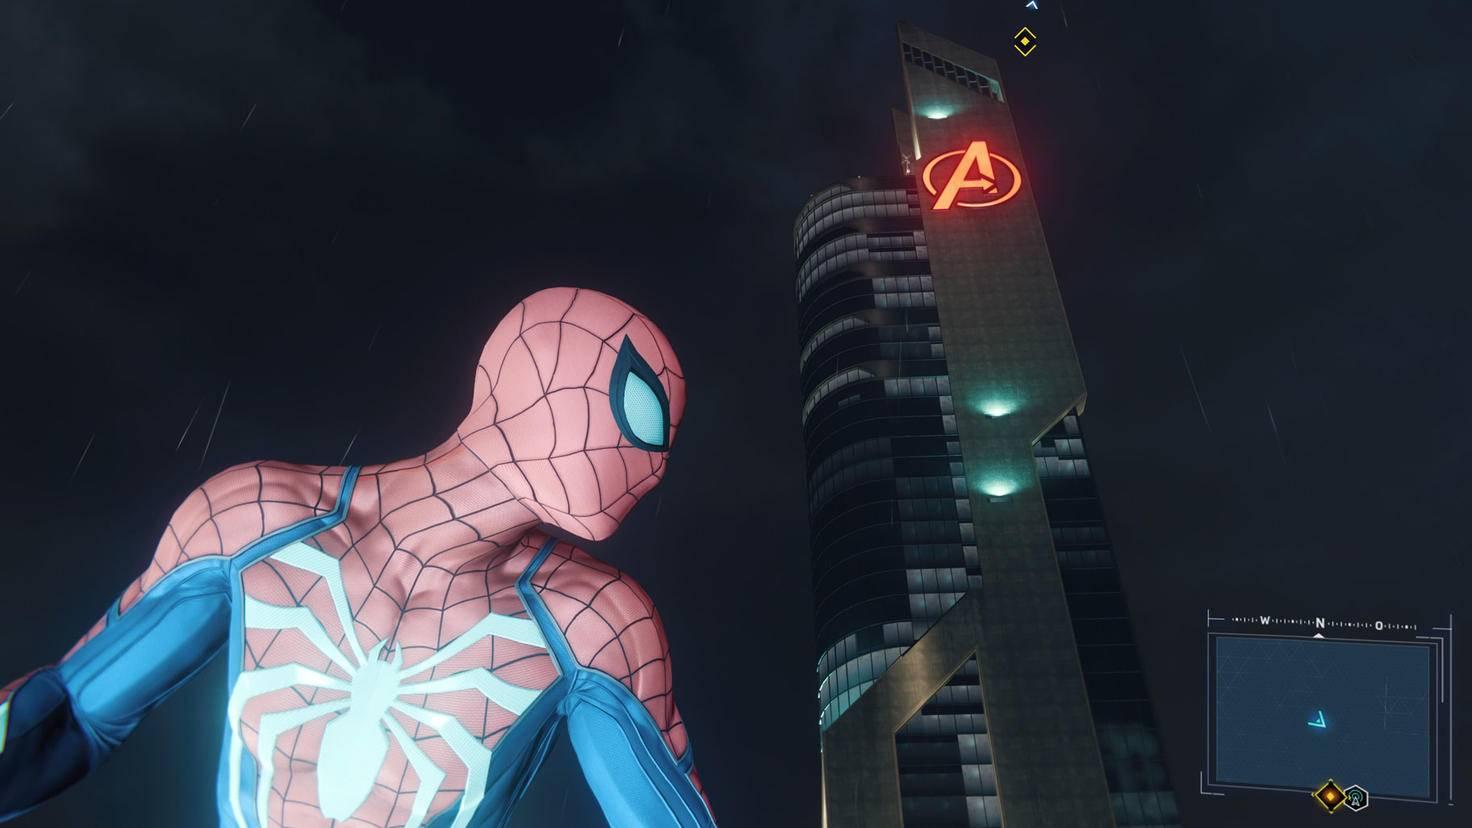 Easter-eggs: Auch der Avengers-Tower steht mitten in New York.